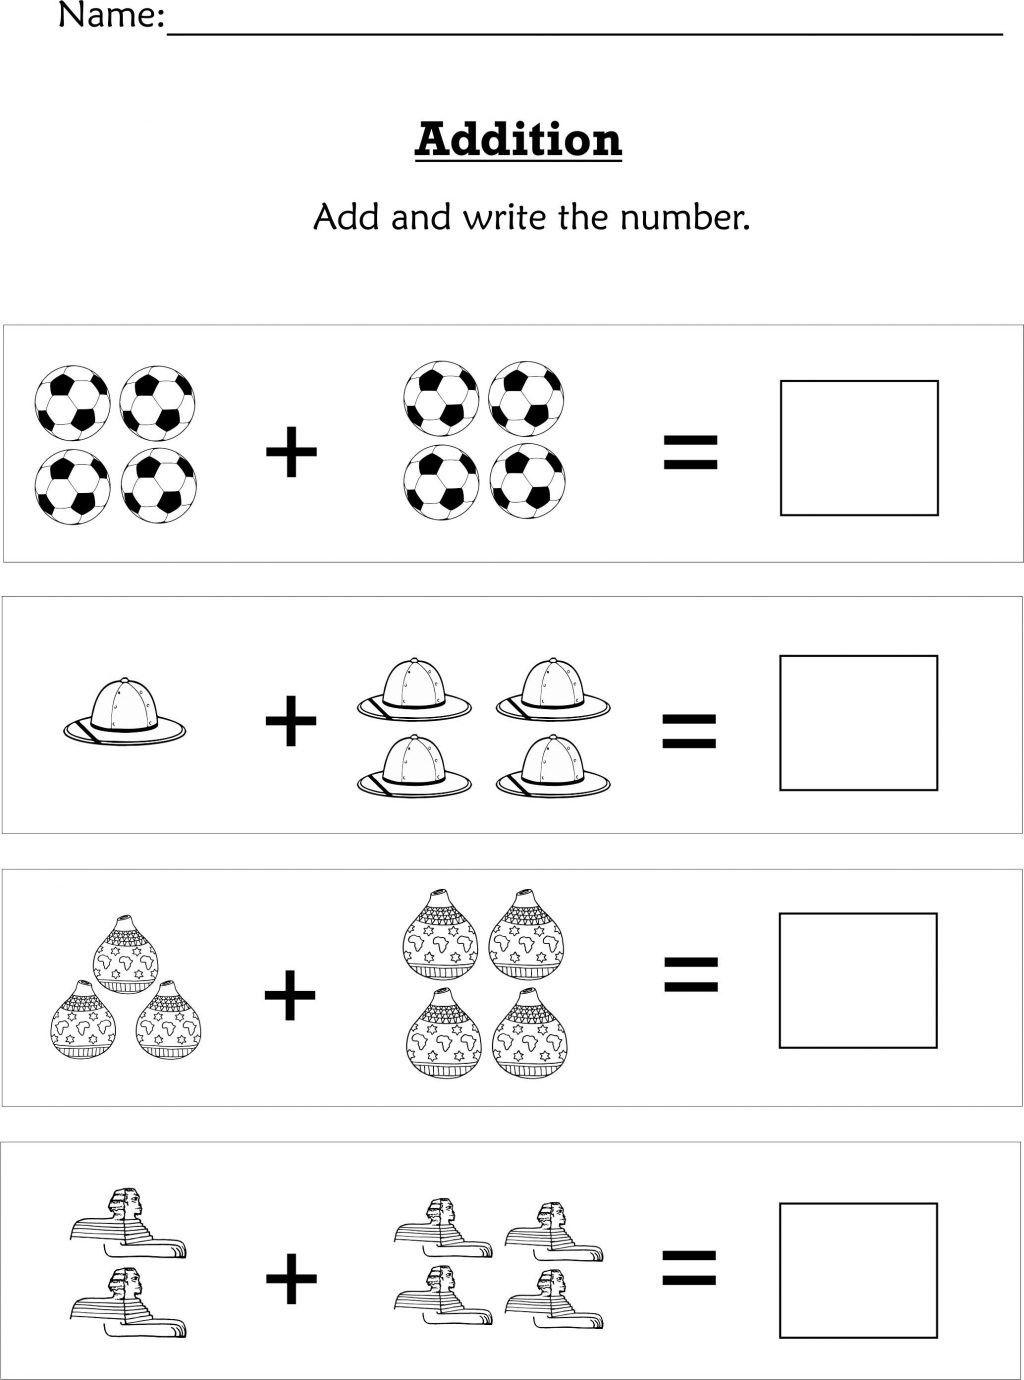 6 Preschool Worksheets Age 4 Preschool Worksheets Age